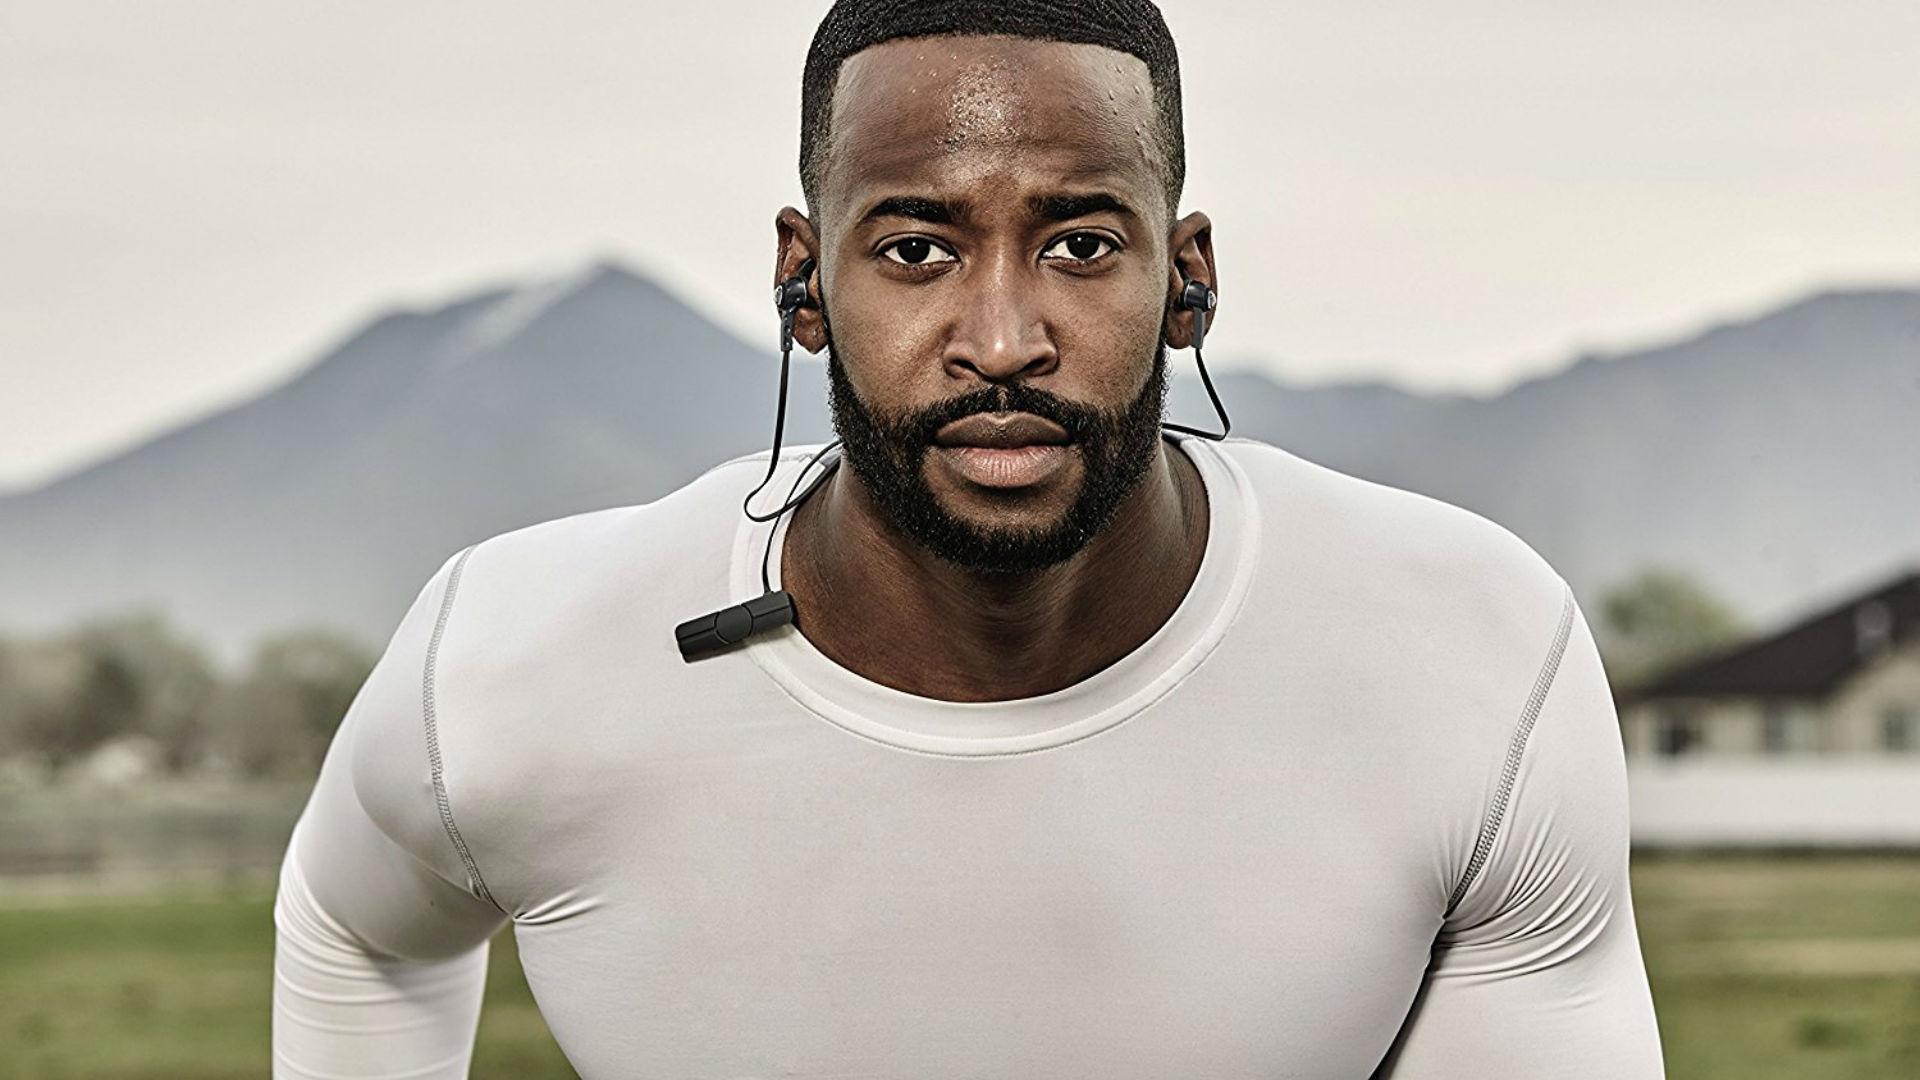 Summit Wireless Bluetooth Sport-Performances Earbuds